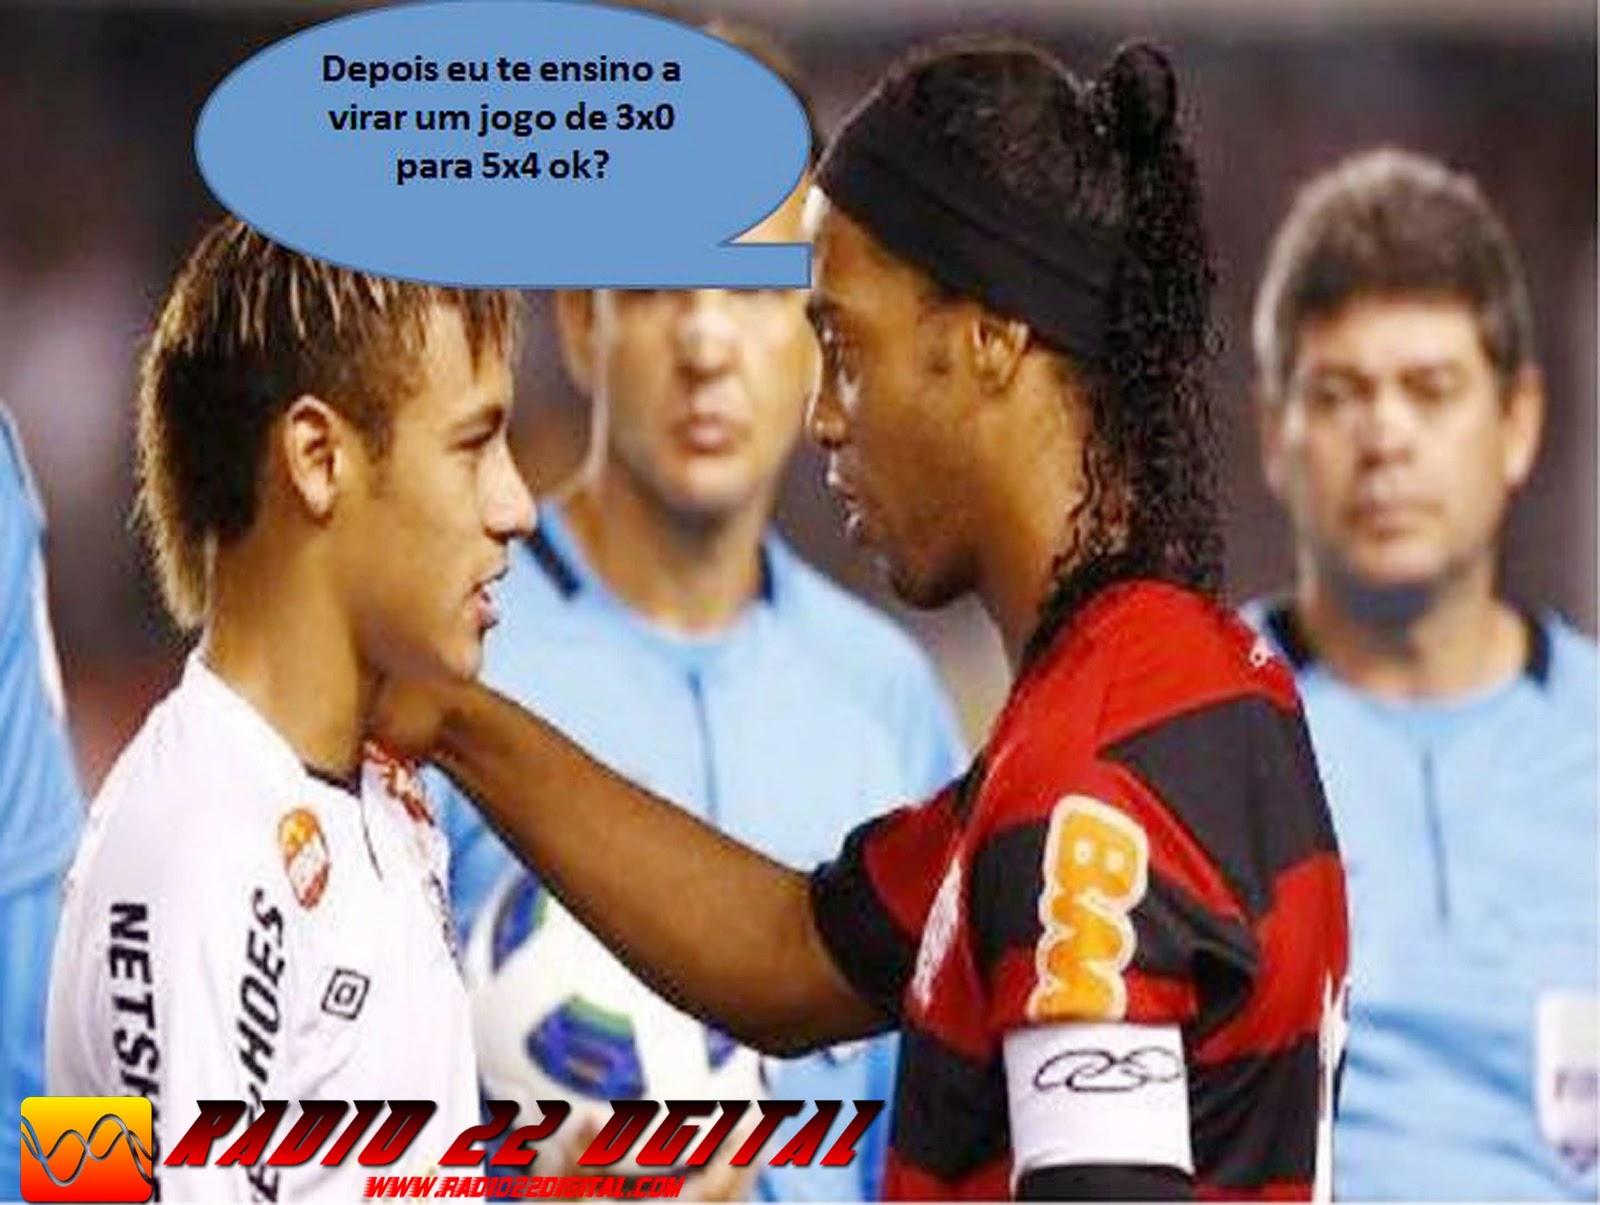 Messi vs ronaldo vs neymar vs ronaldinho wallpaper